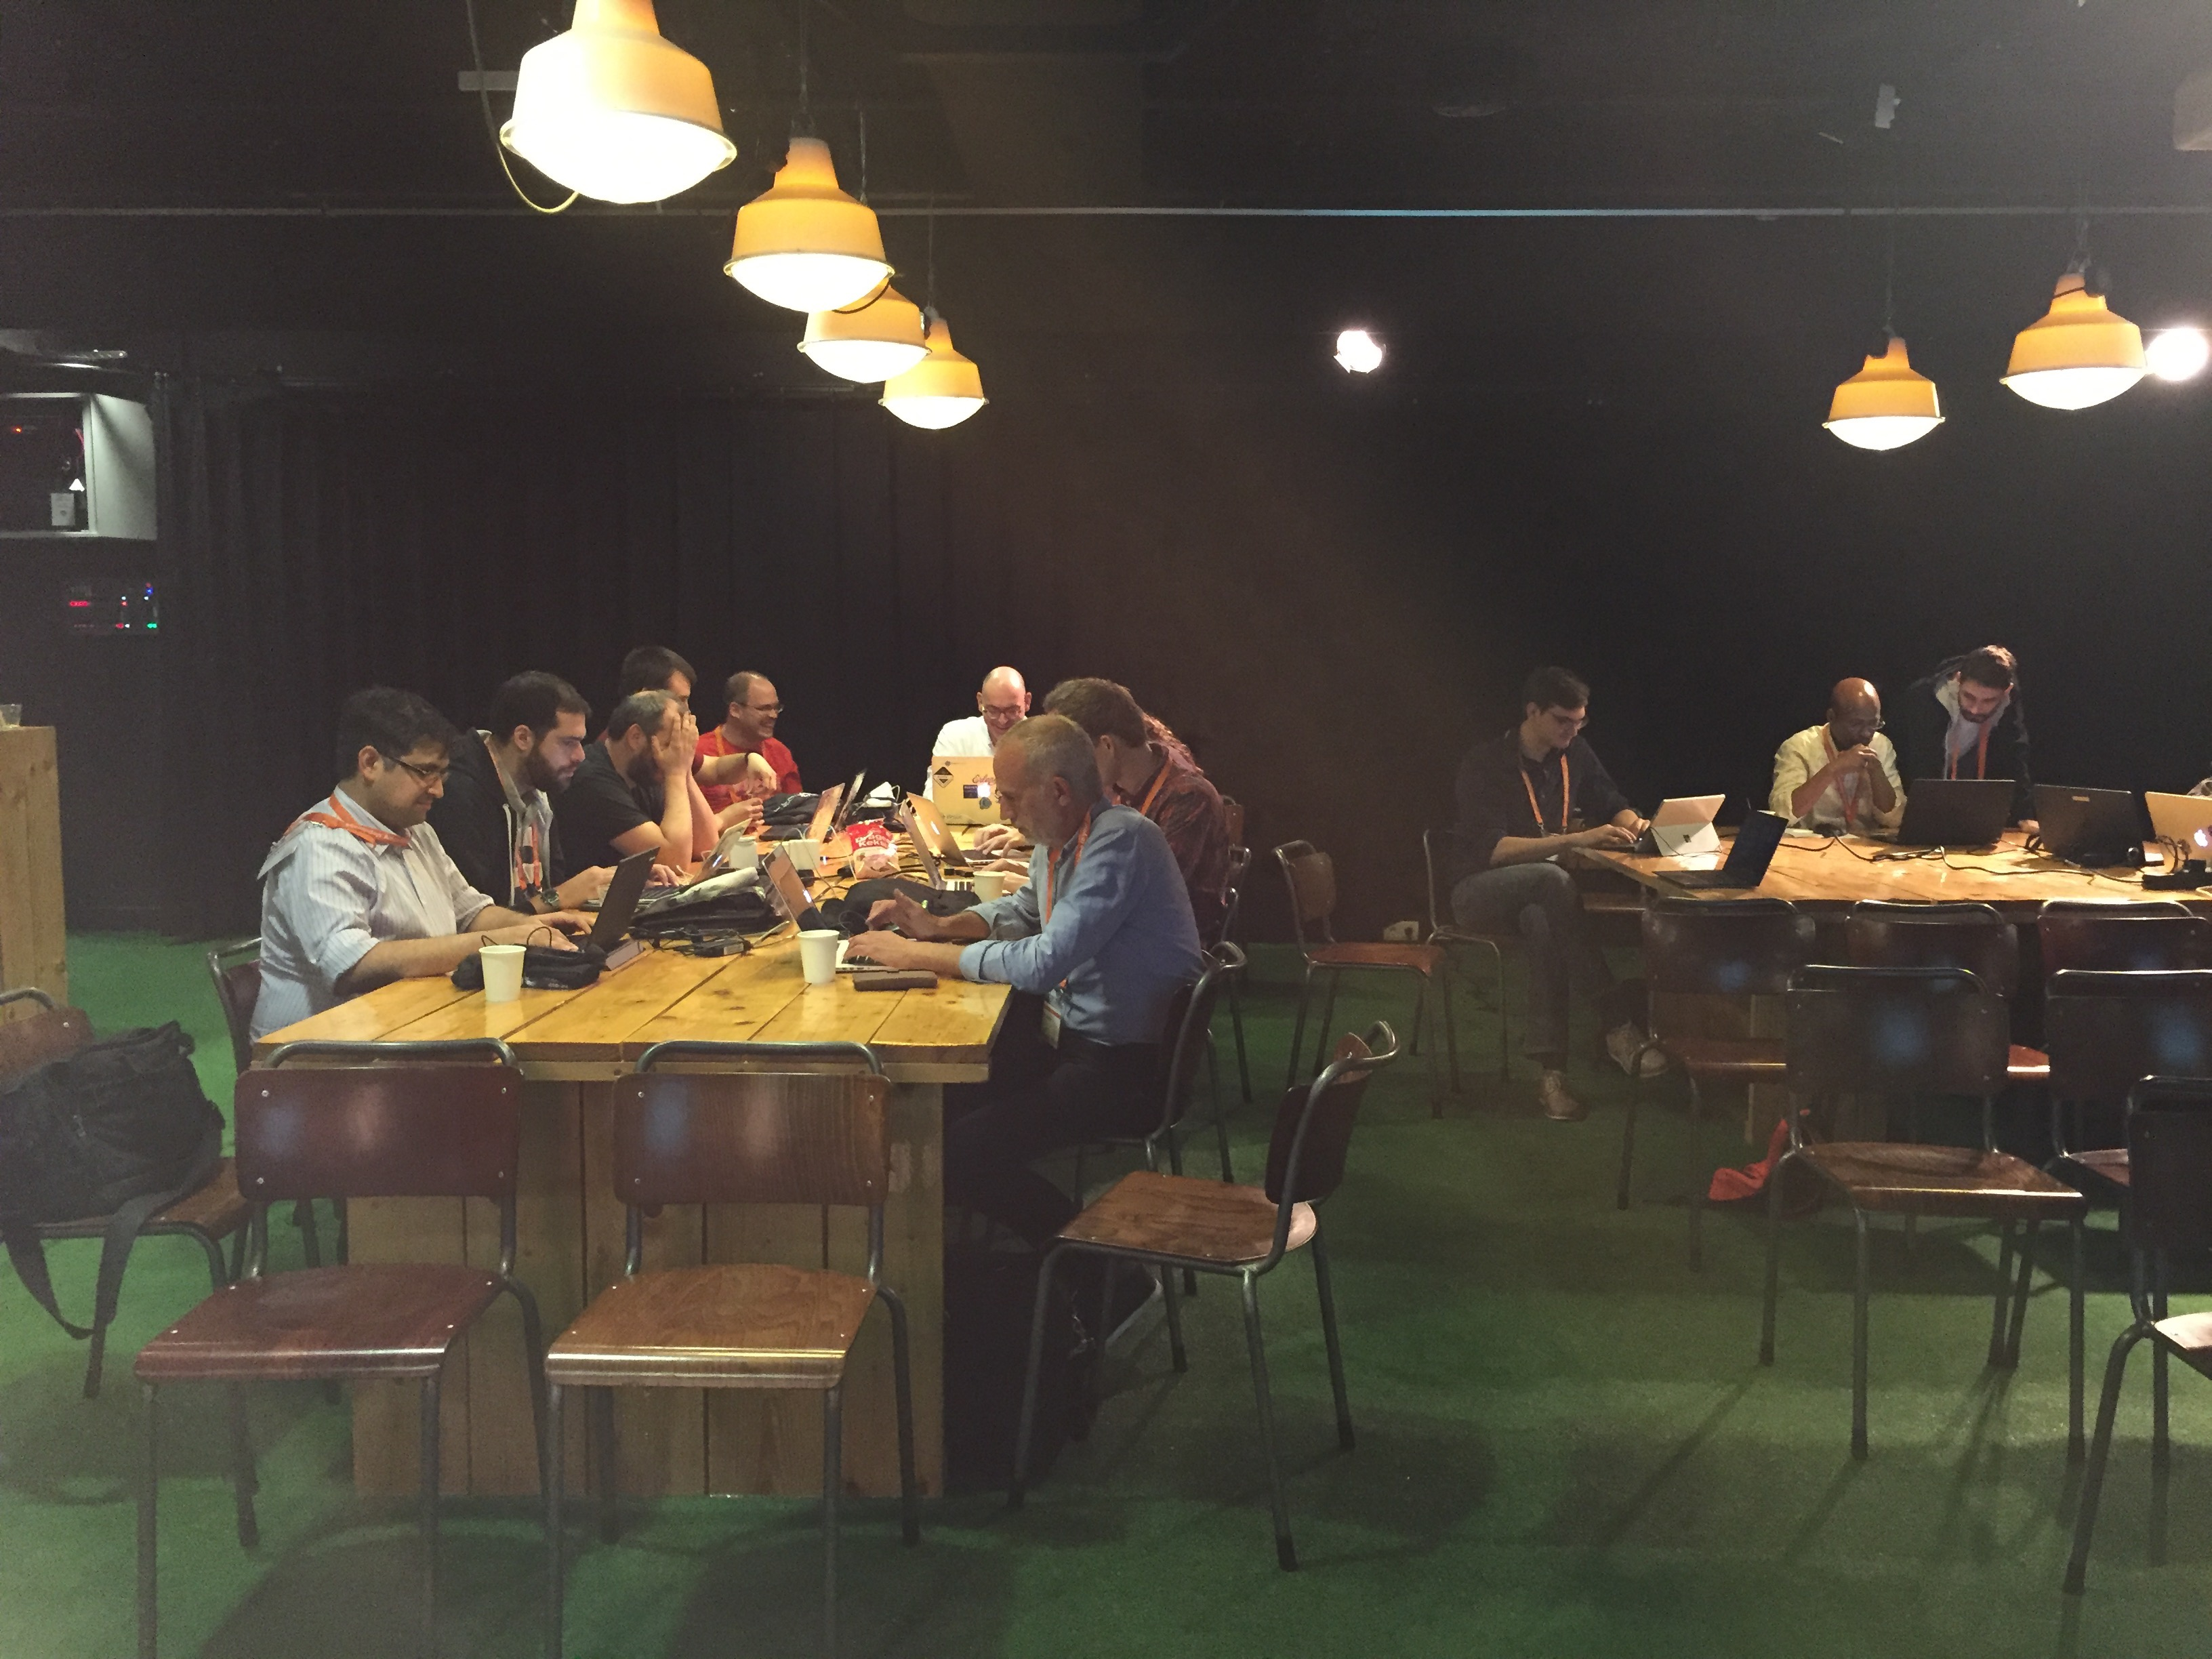 icingacamp-amsterdam-2017-workshop